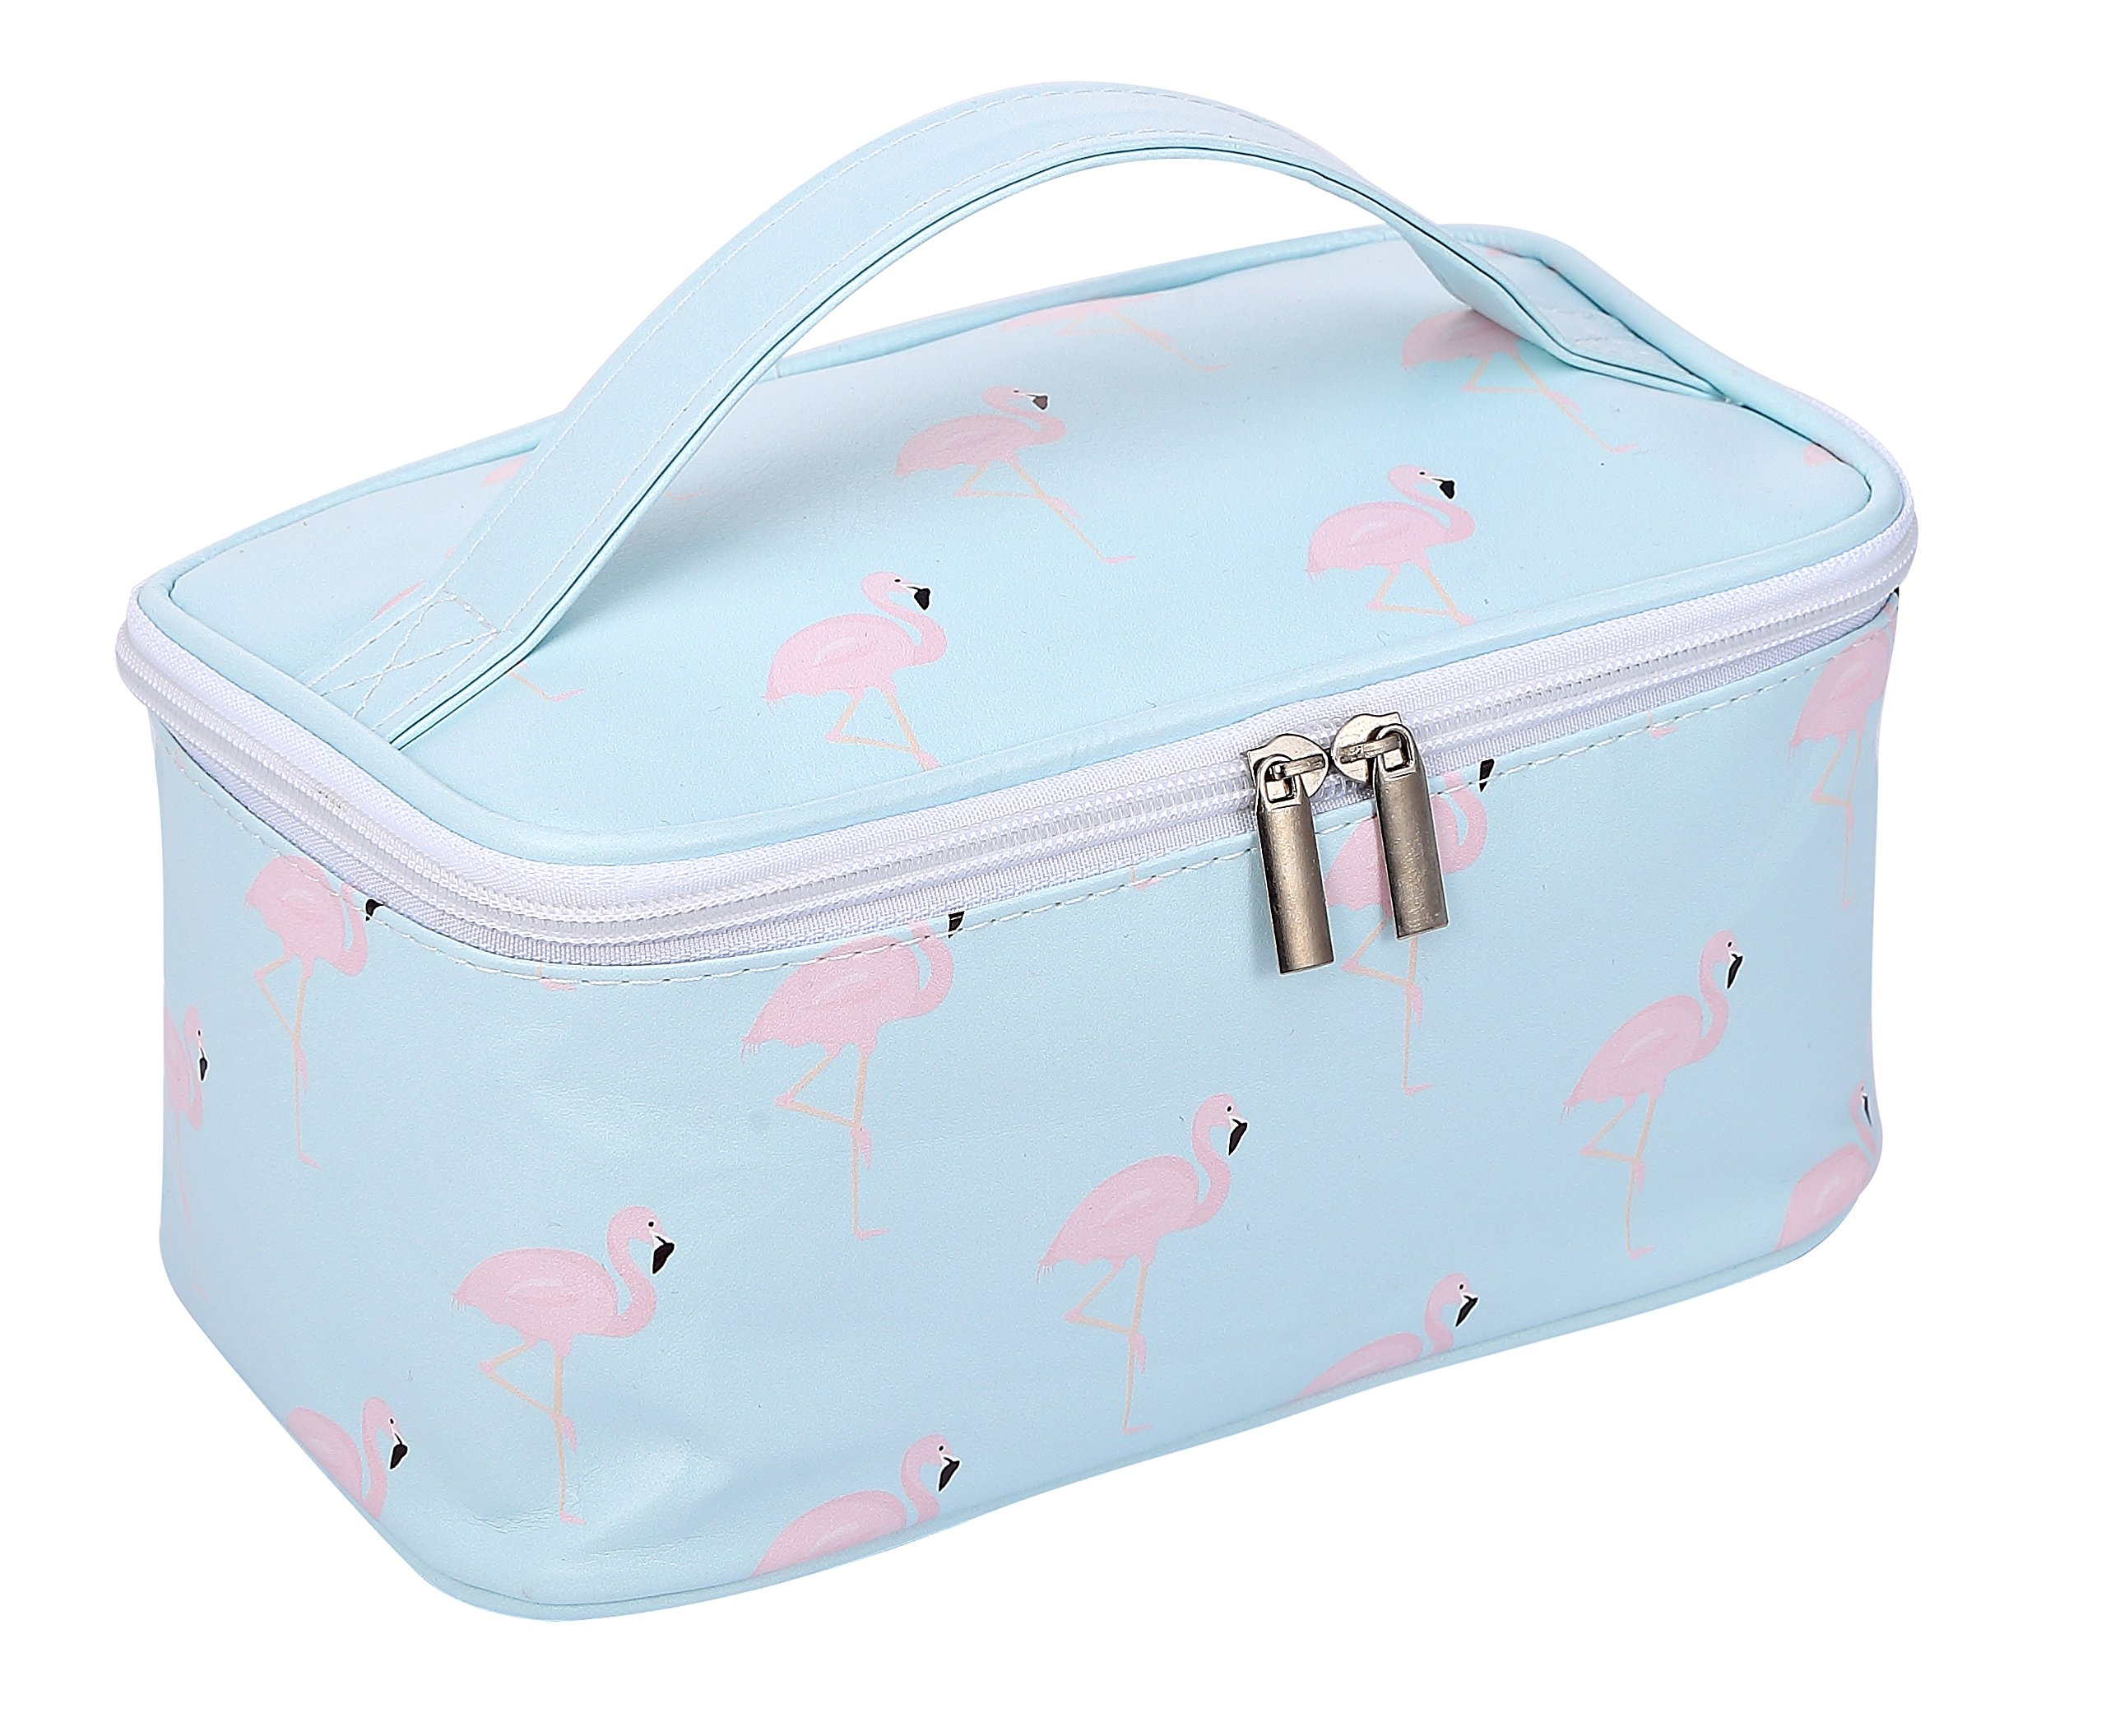 HOYOFO Makeup Bags Flamingo Travel Cosmetic Case Toiletry Storage Bag for Women